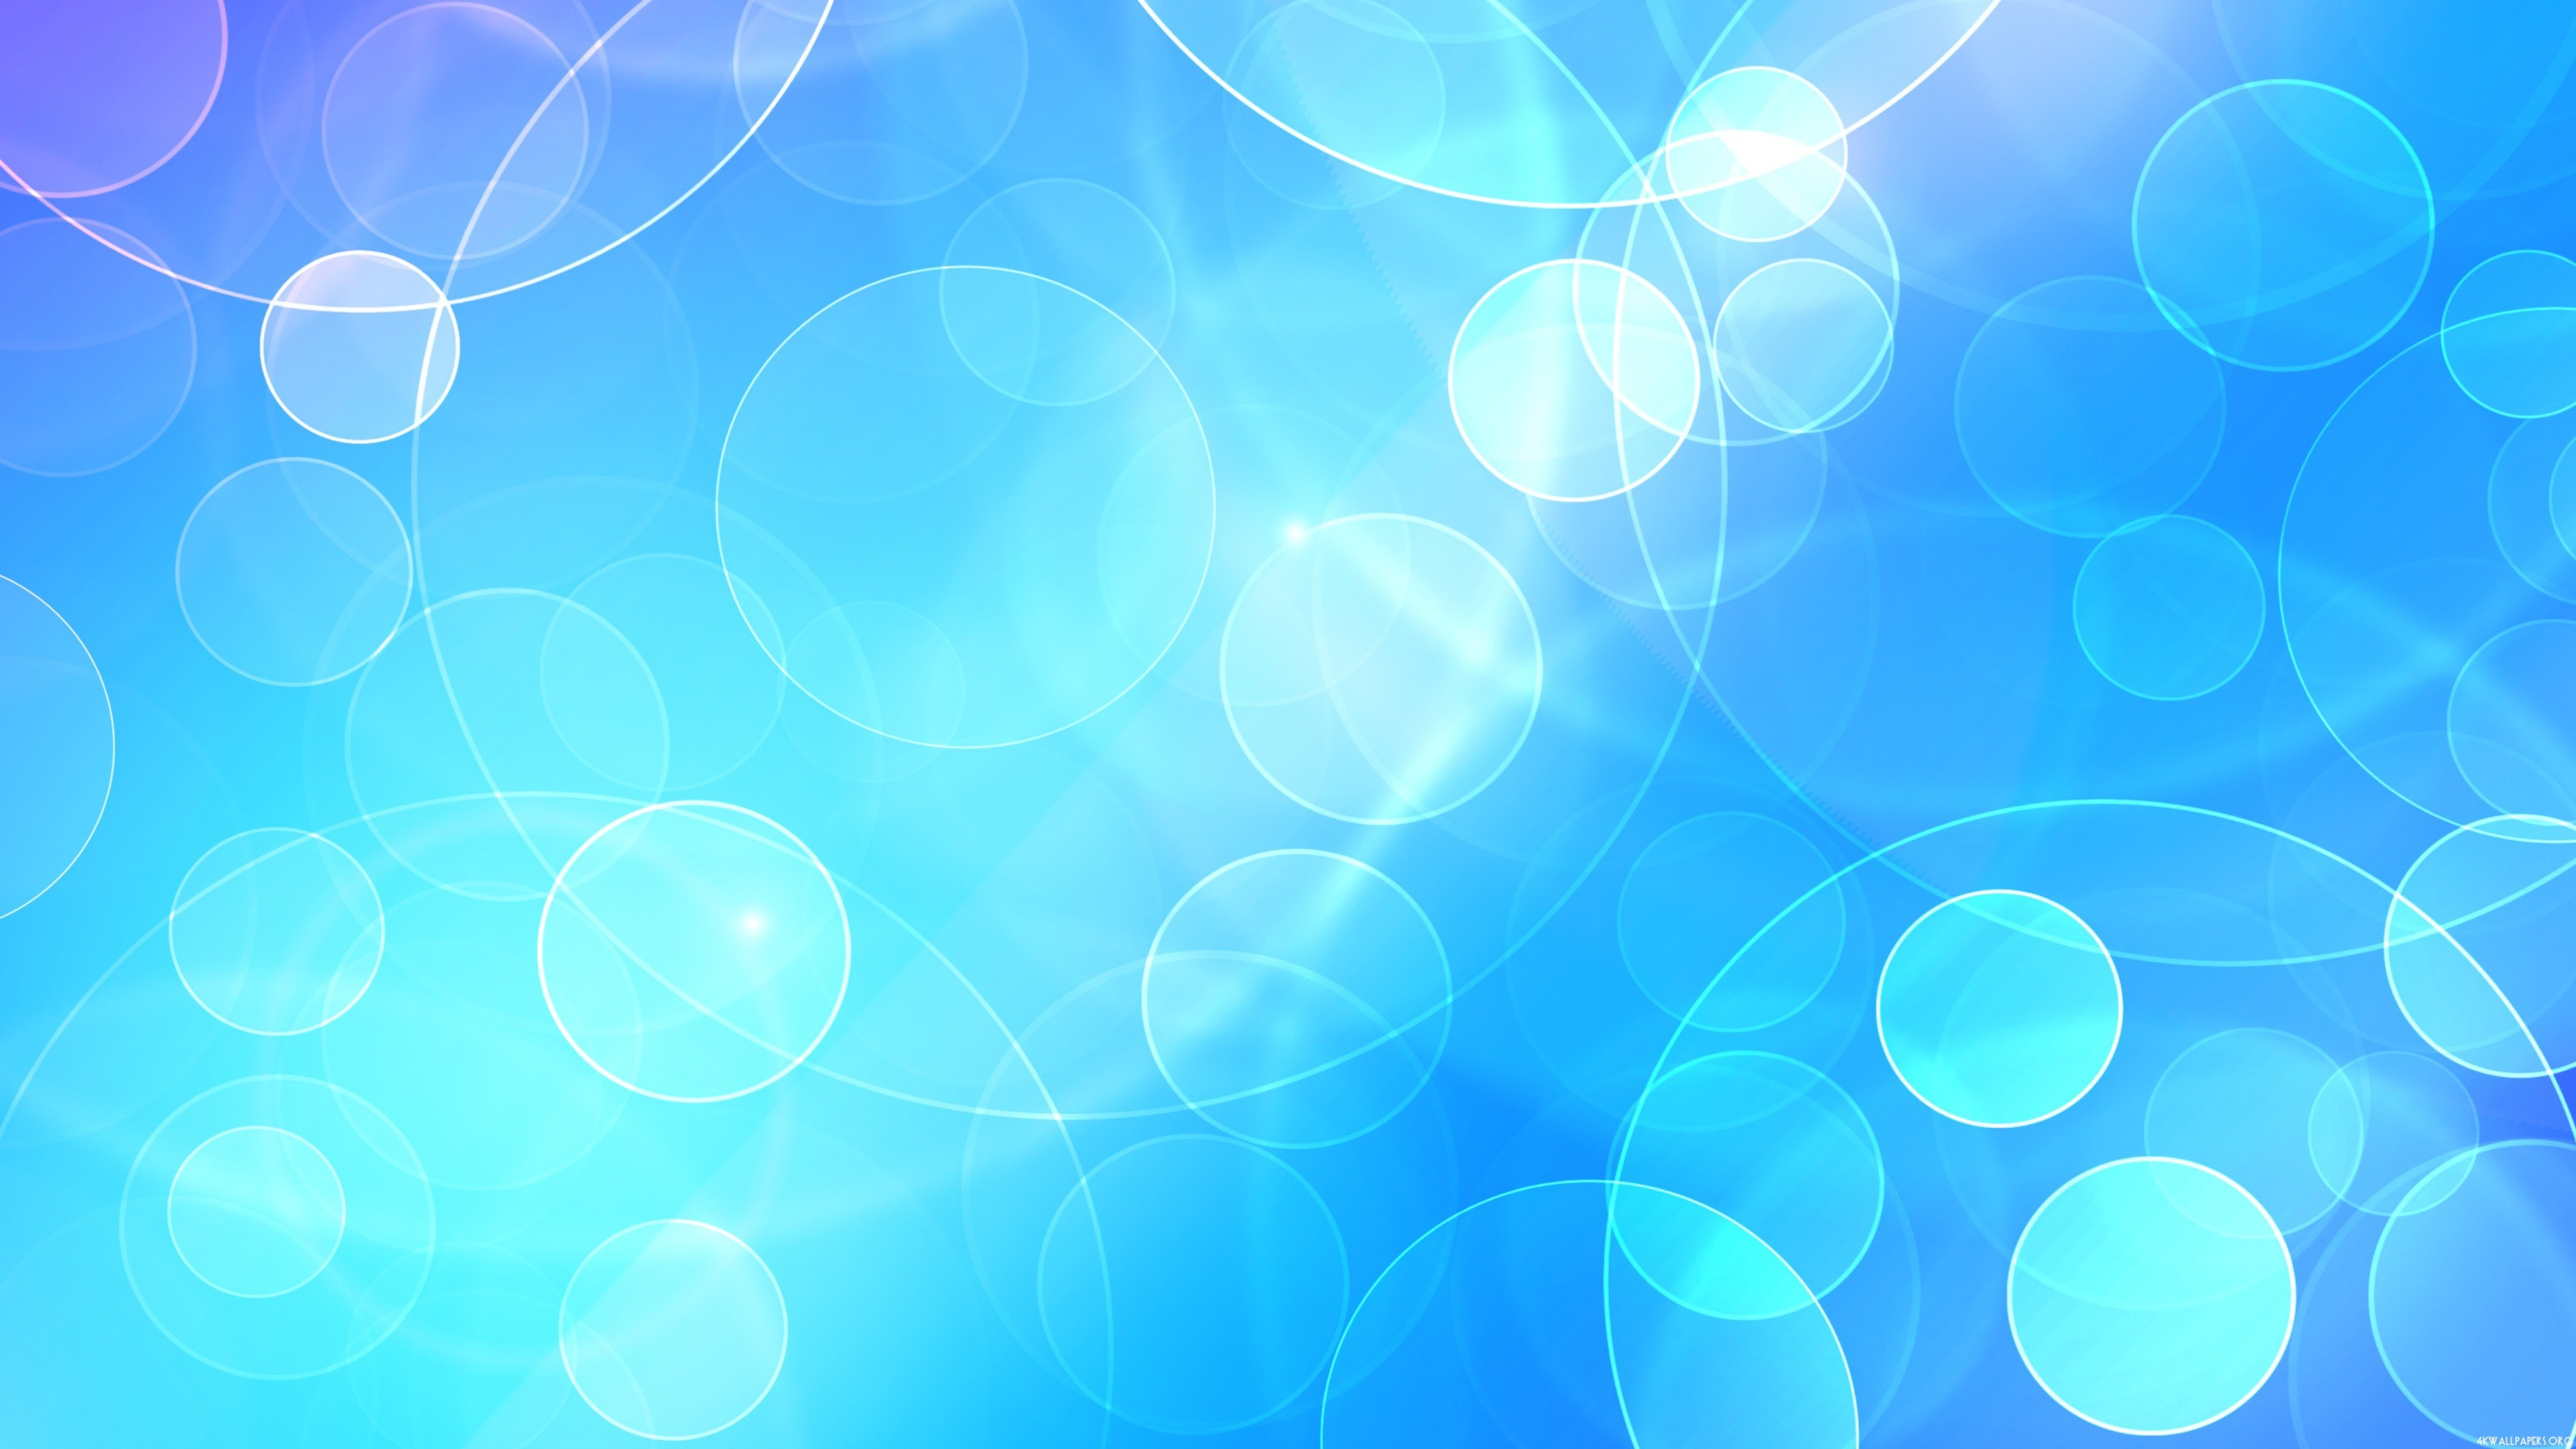 Blue Wallpaper For Computer